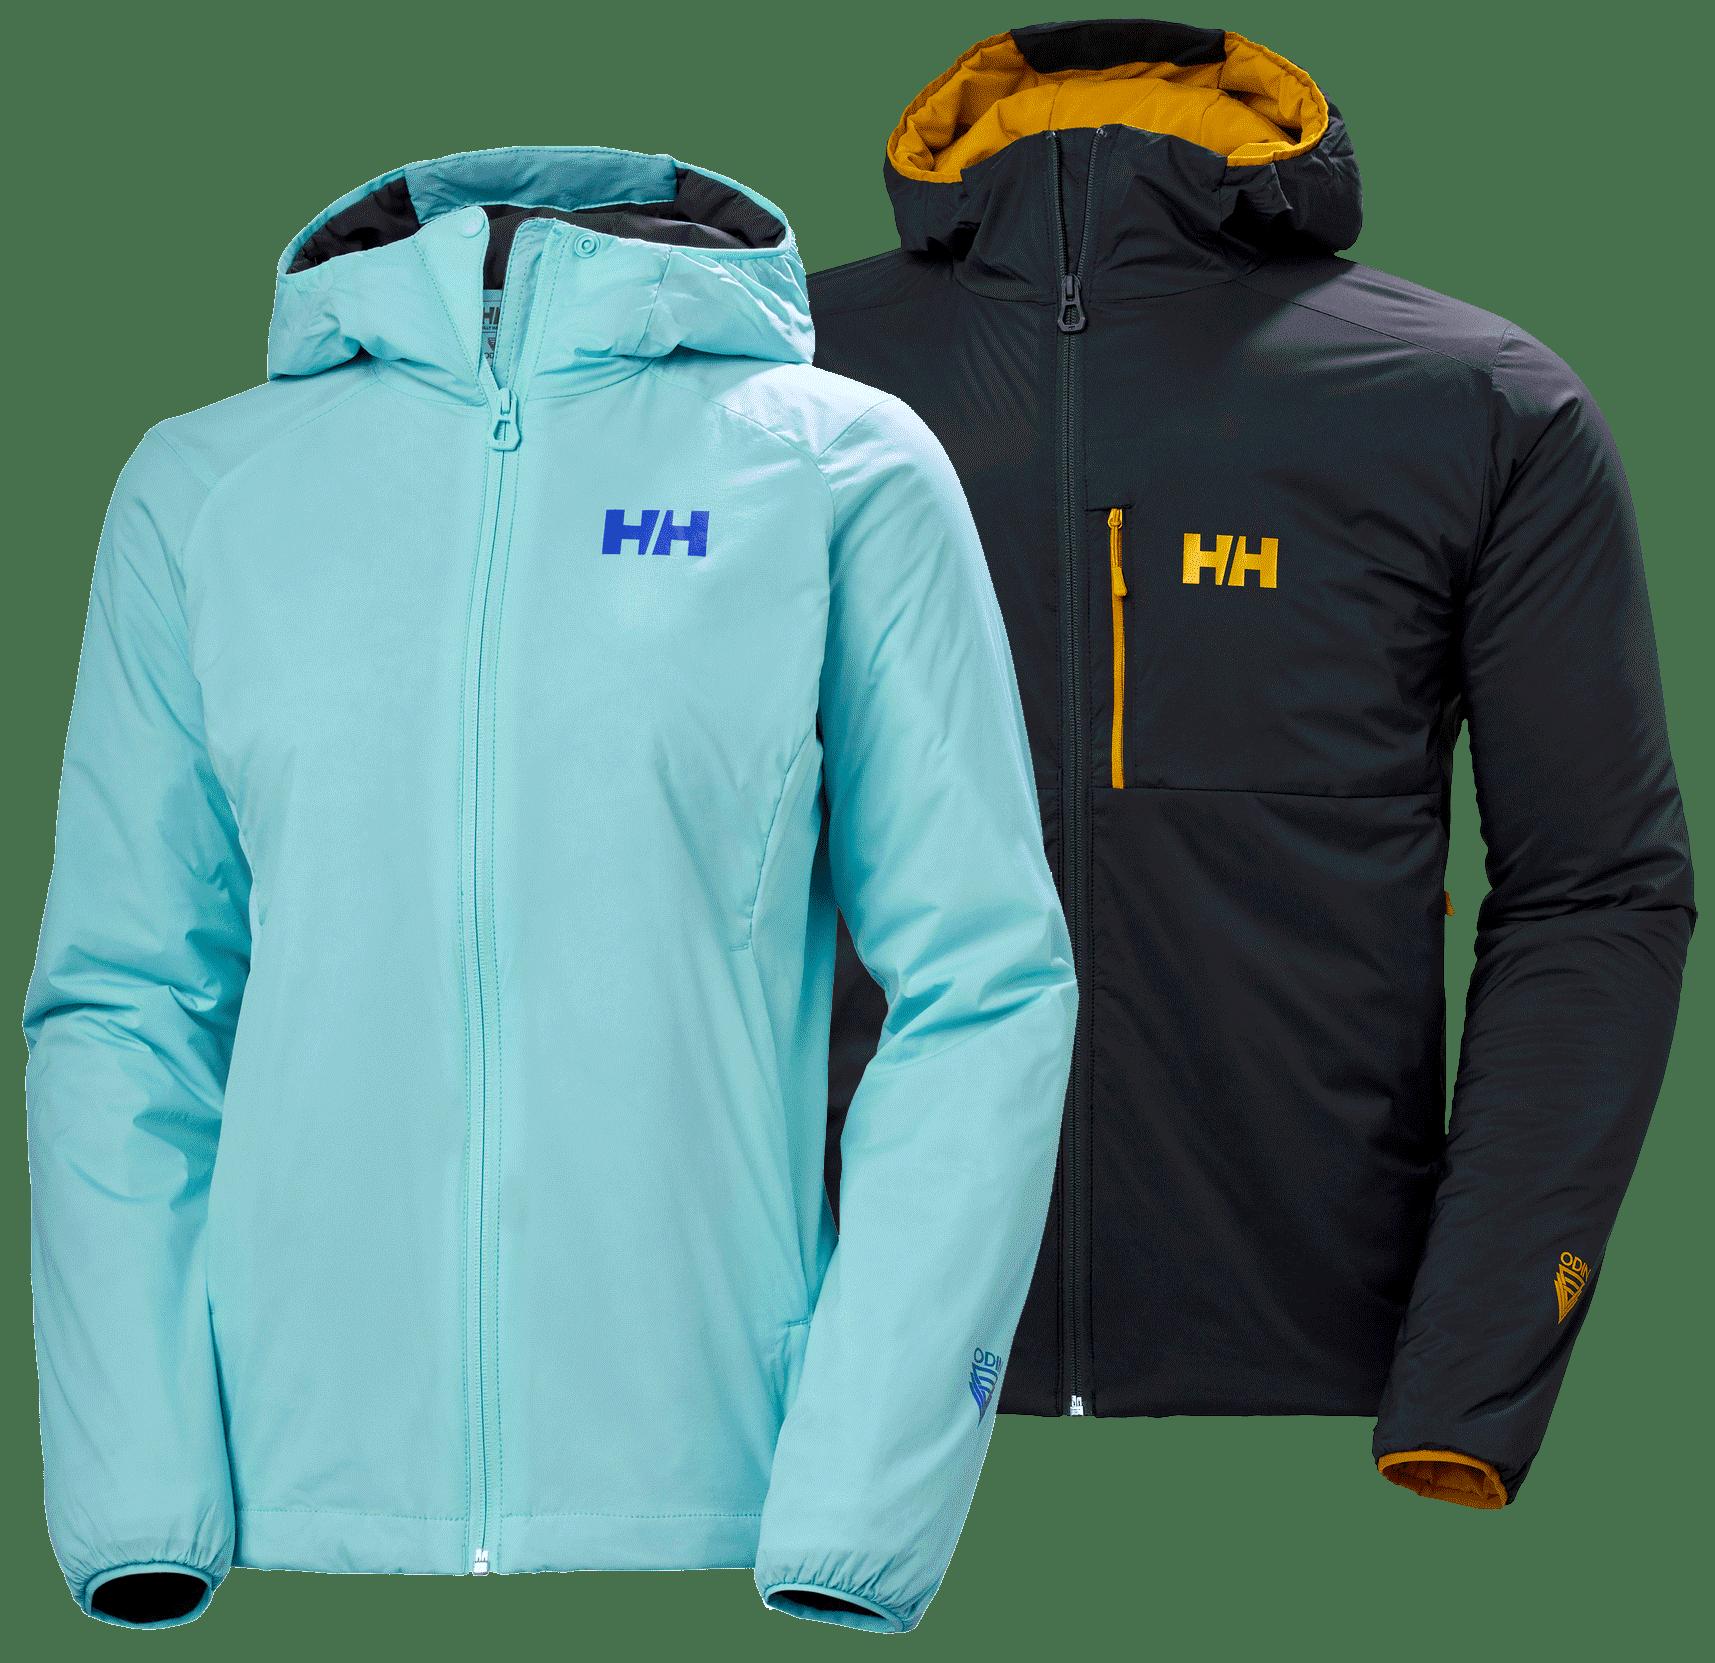 Outerwear, White, Jersey, Coat, Product, Azure, Blue, Textile, Neck, Sleeve